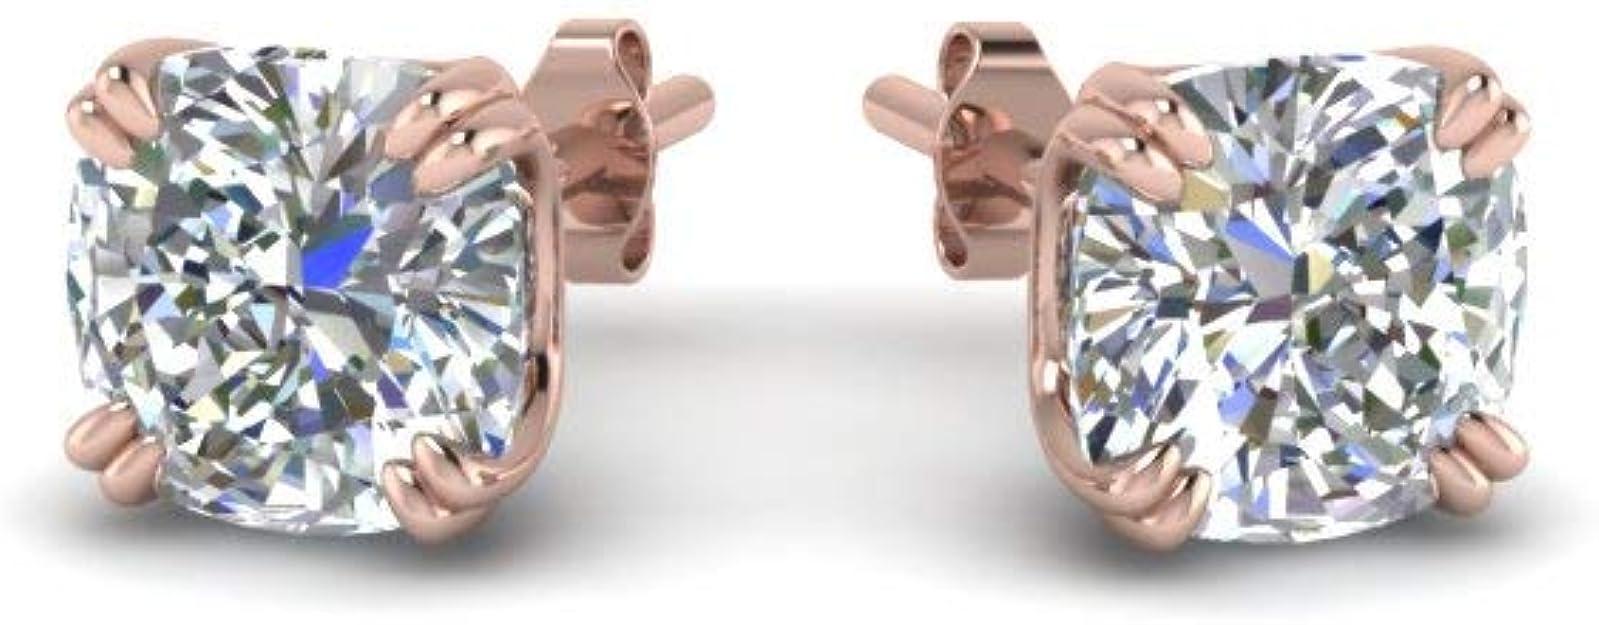 8mm Created Diamond Round Cut 925 Sterling Silver Stud Earrings 4.00ct VVS1